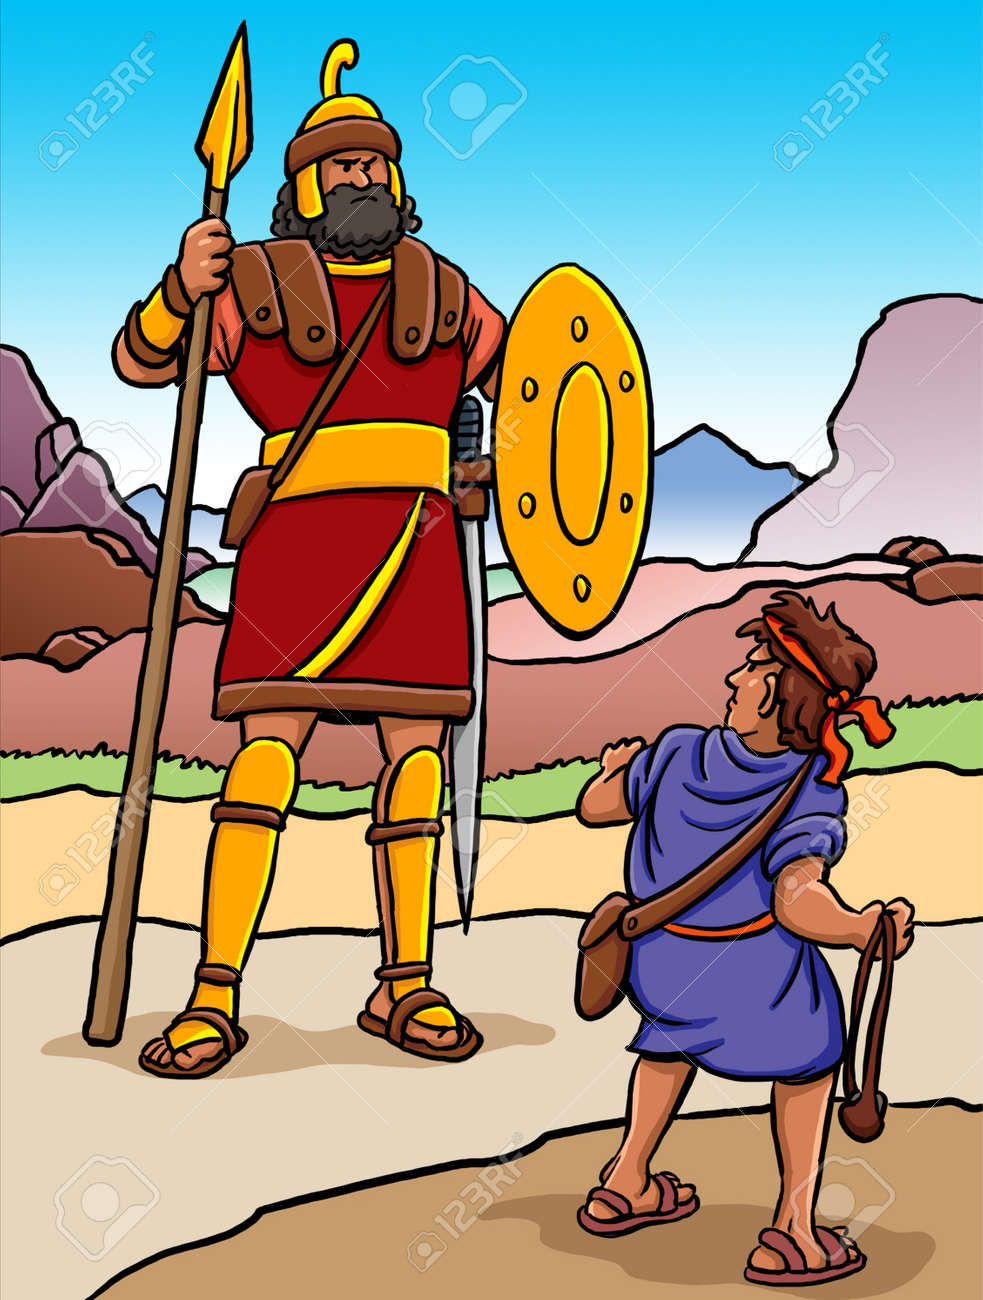 Cartoon of David and Goliath - 126584132